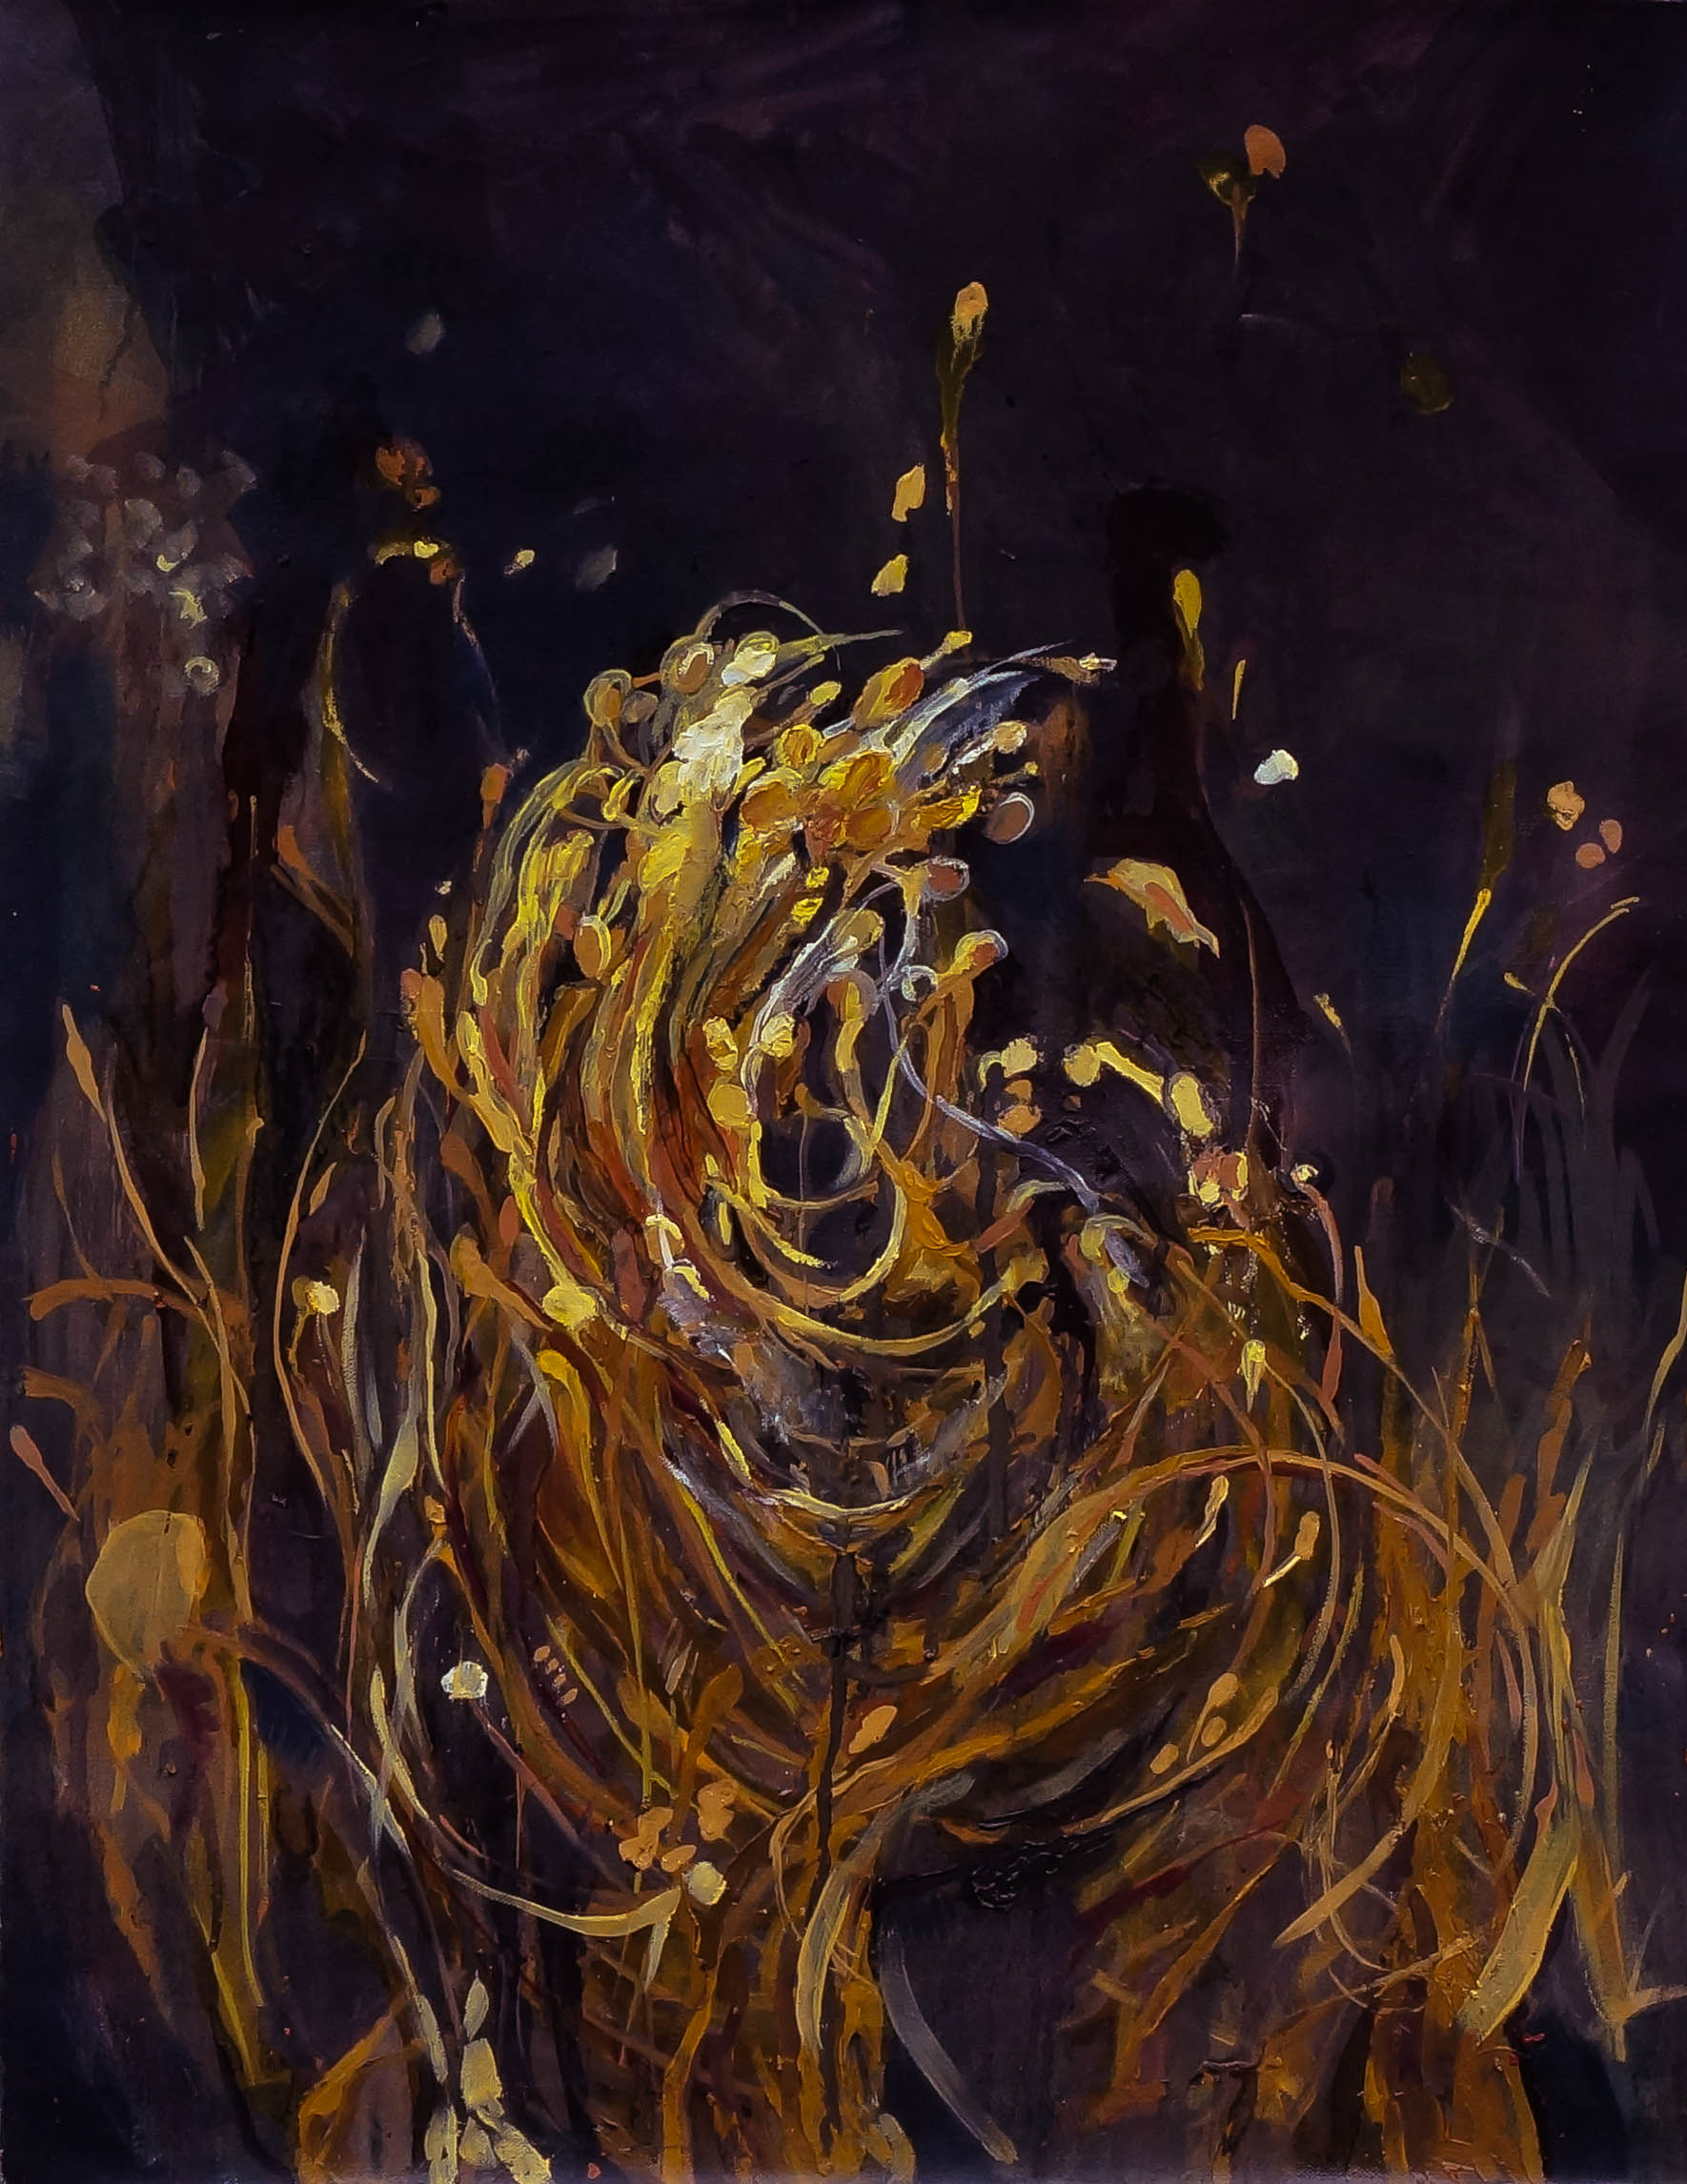 North Diamond Street Grass II, oil on canvas, 18 x 24 inches